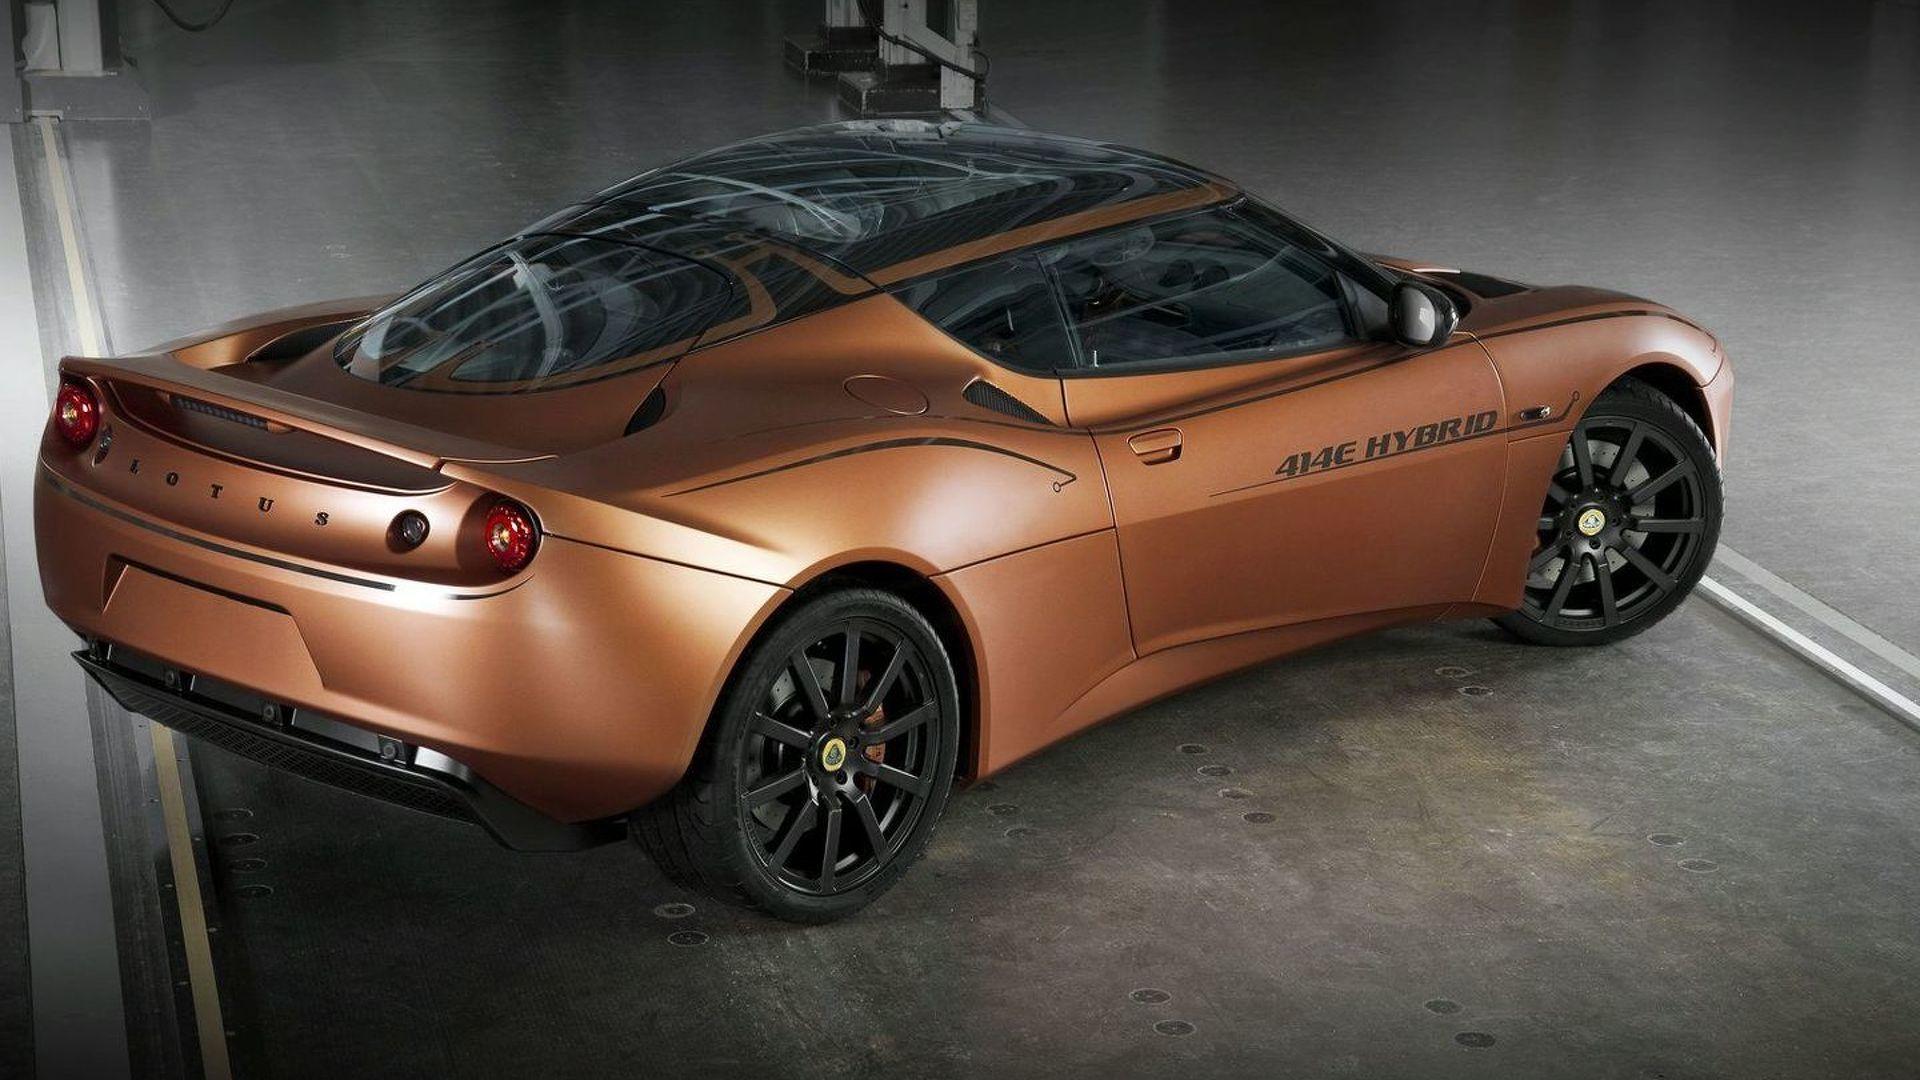 Lotus Evora 414E Hybrid prototype coming to Goodwood